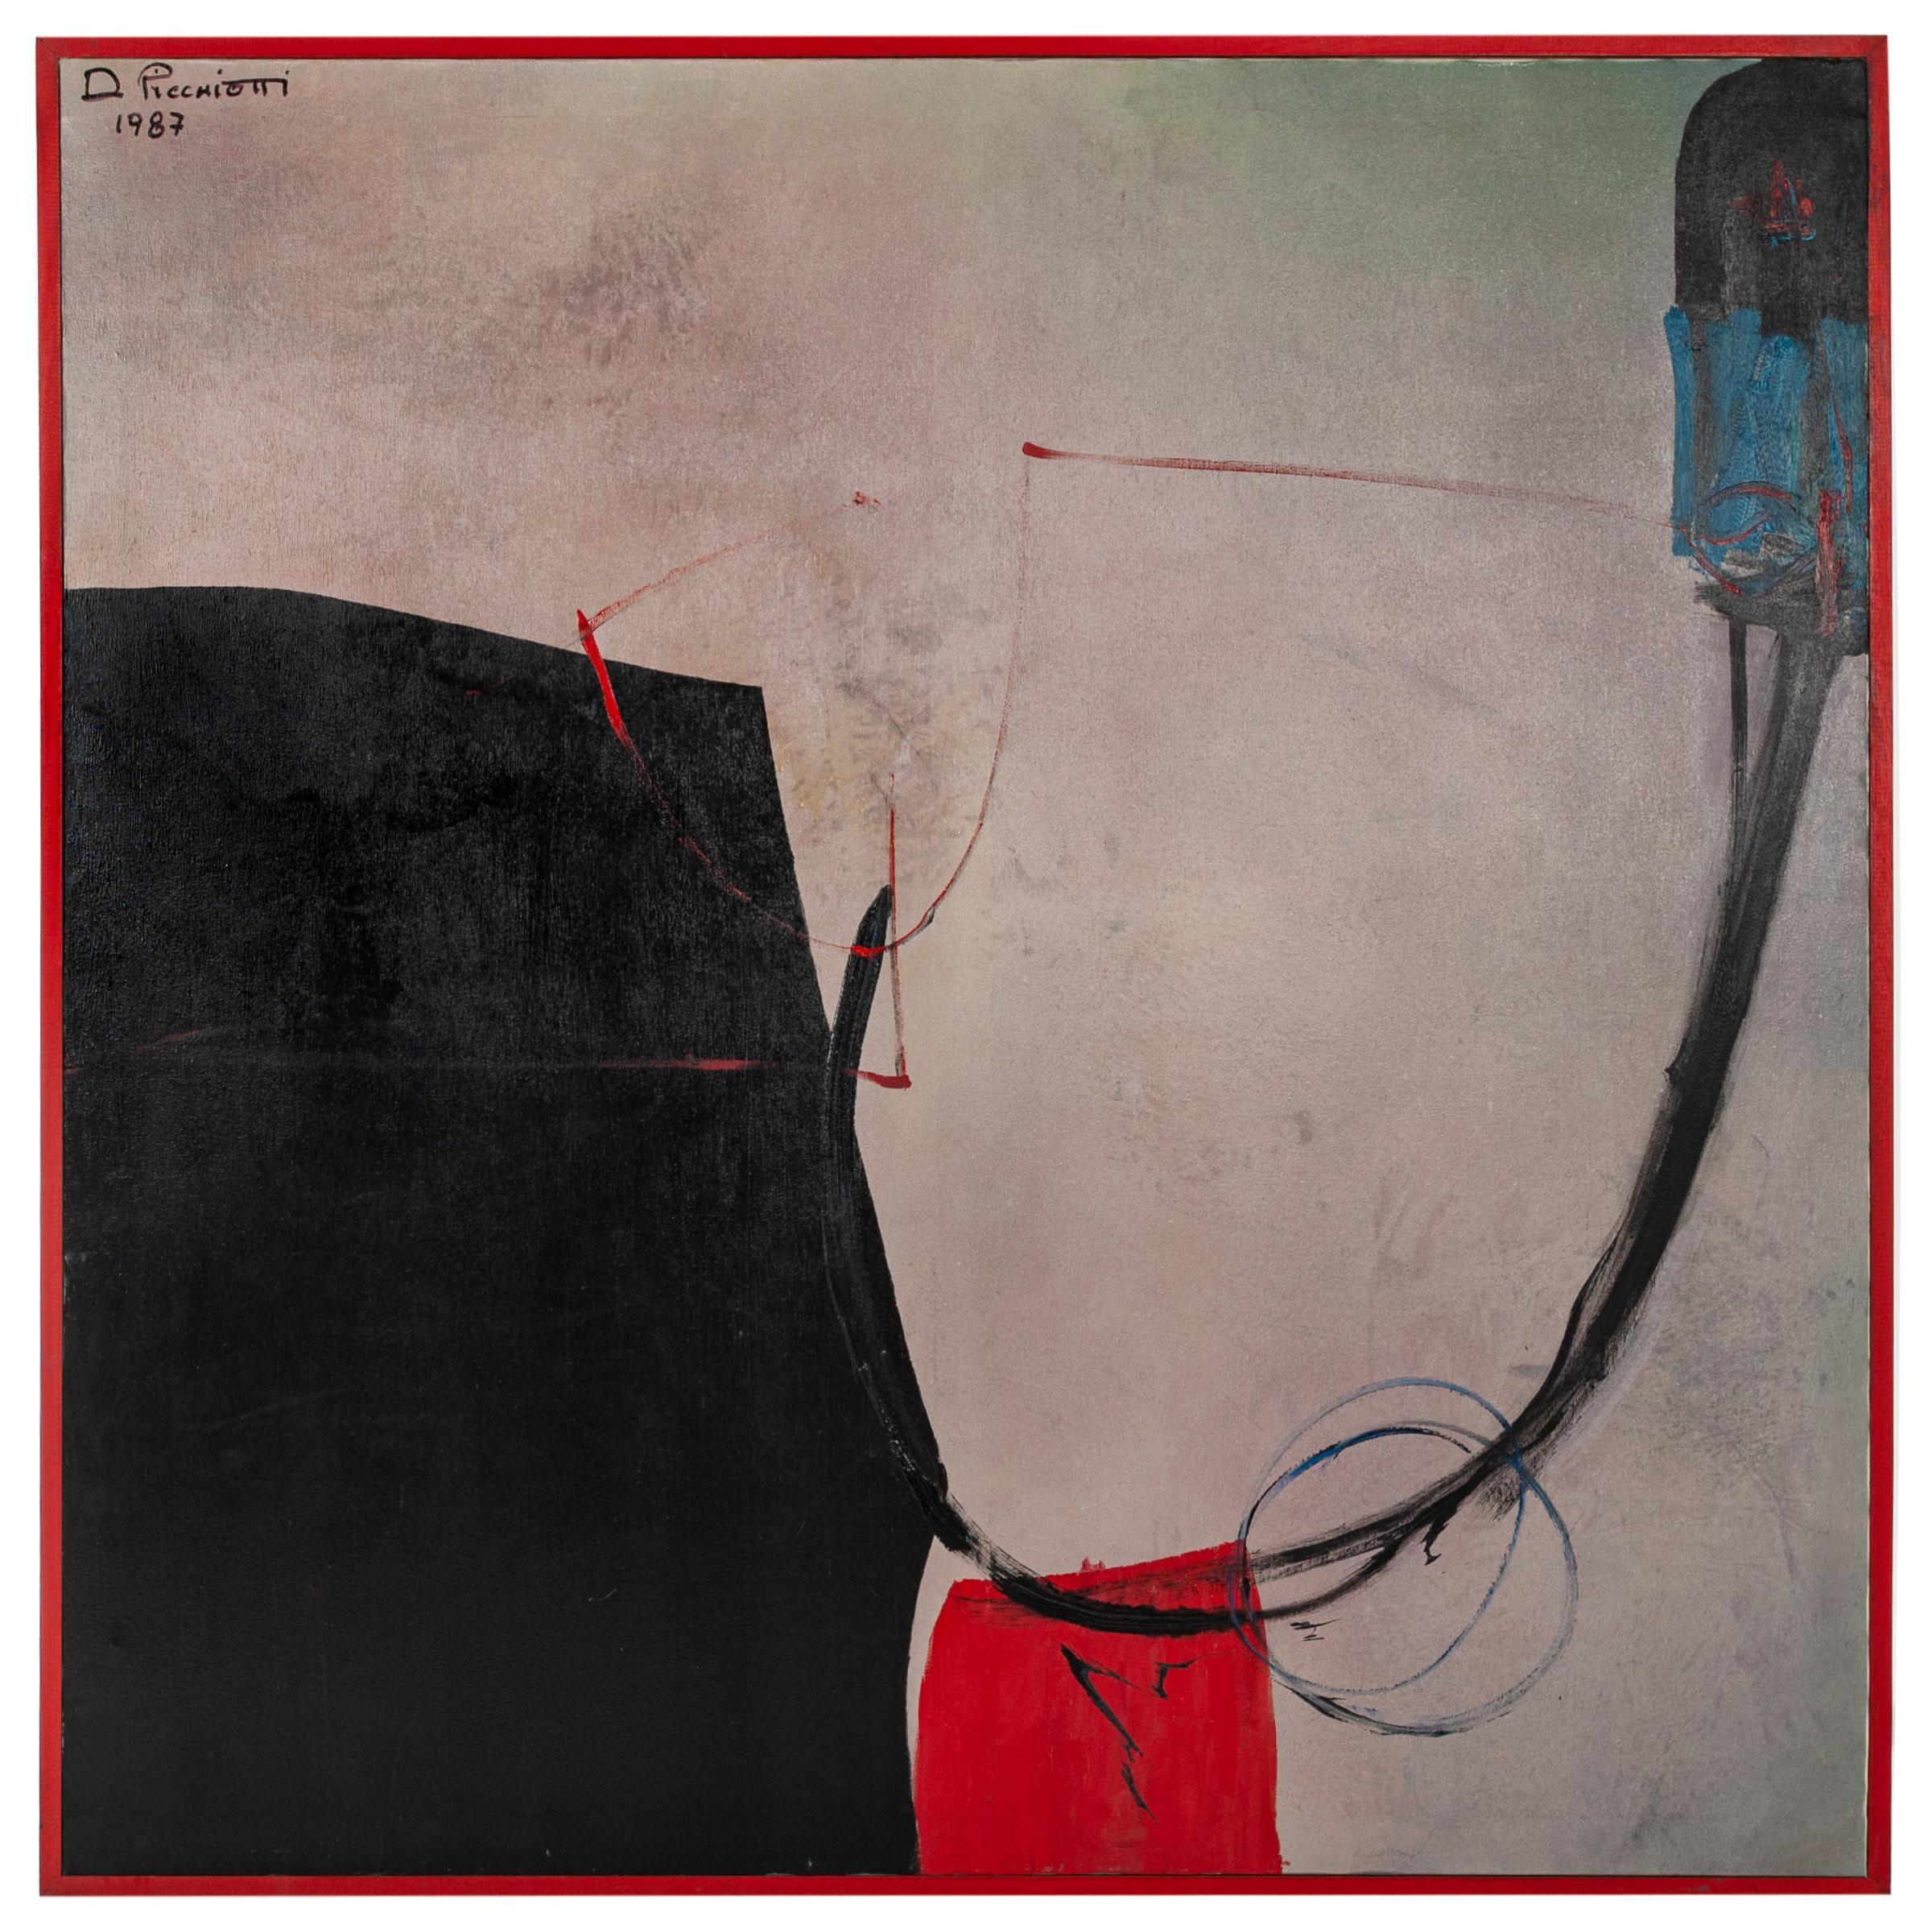 Italian Art Informel Painting Black, Grey, Red, Blue by Danilo Picchiotti, 1987